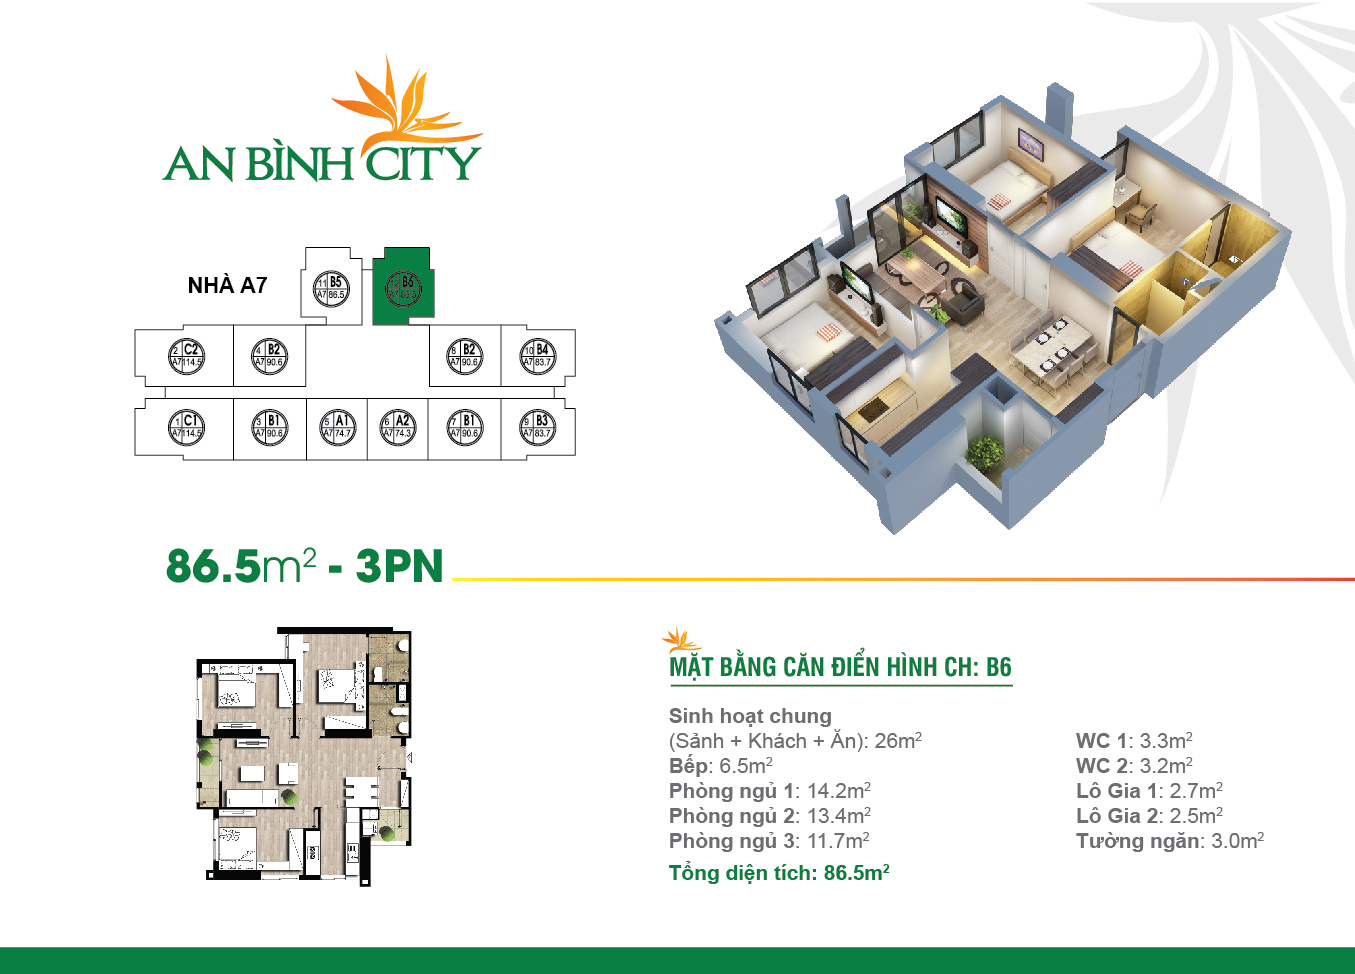 brochure-anbinhcity2-11